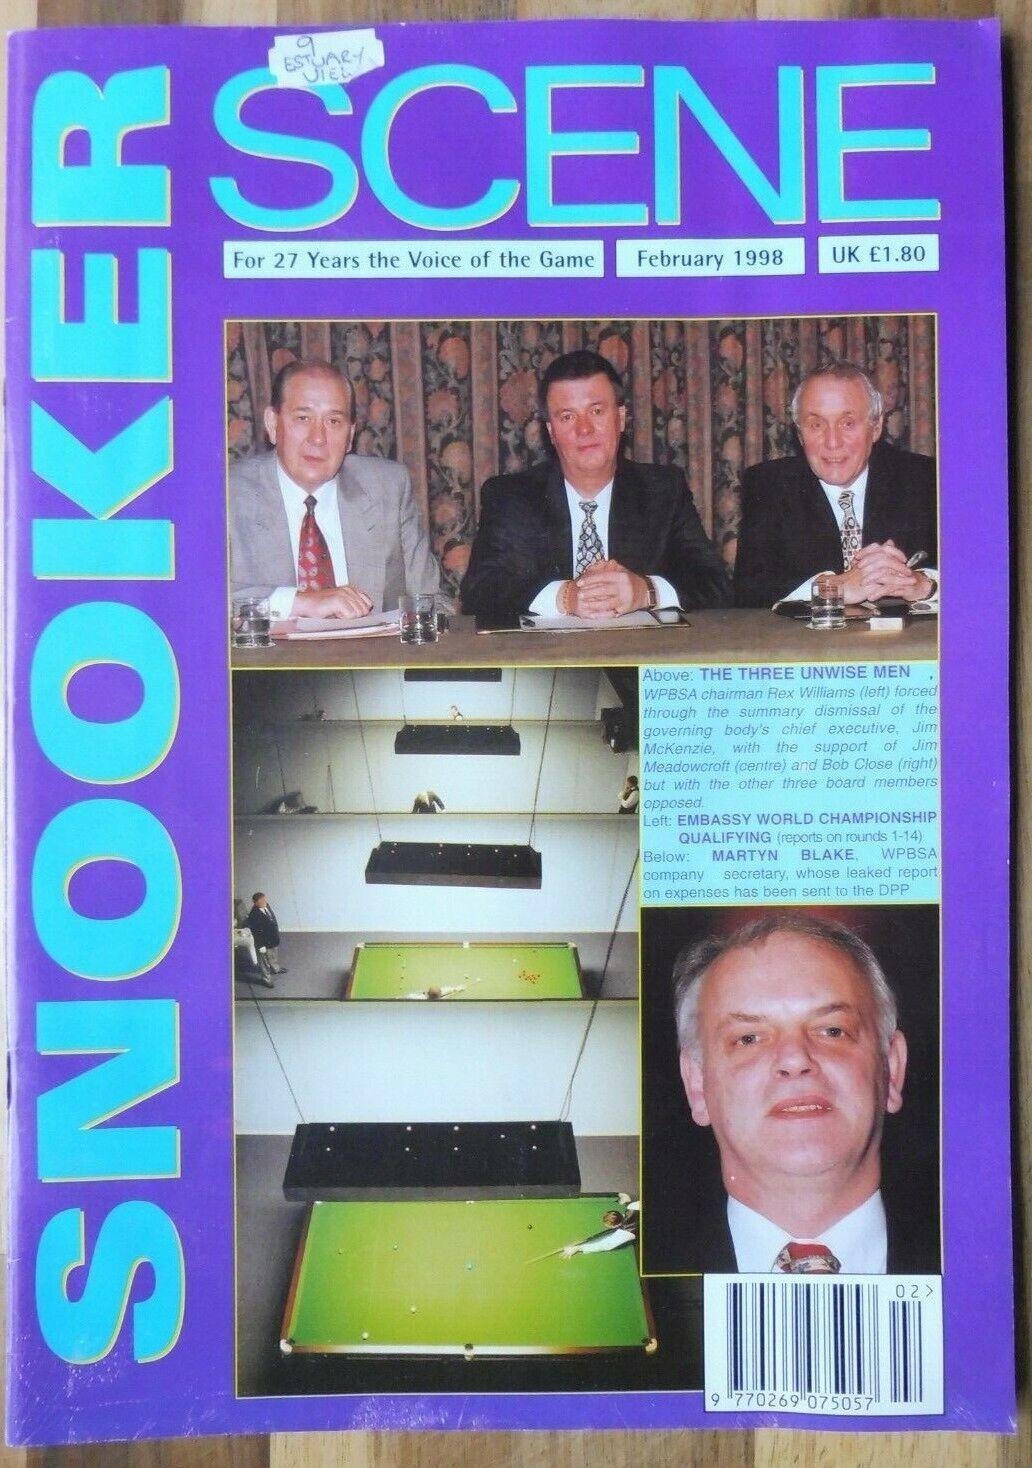 Snooker Scene Magazine, February 1998, Good Condition.